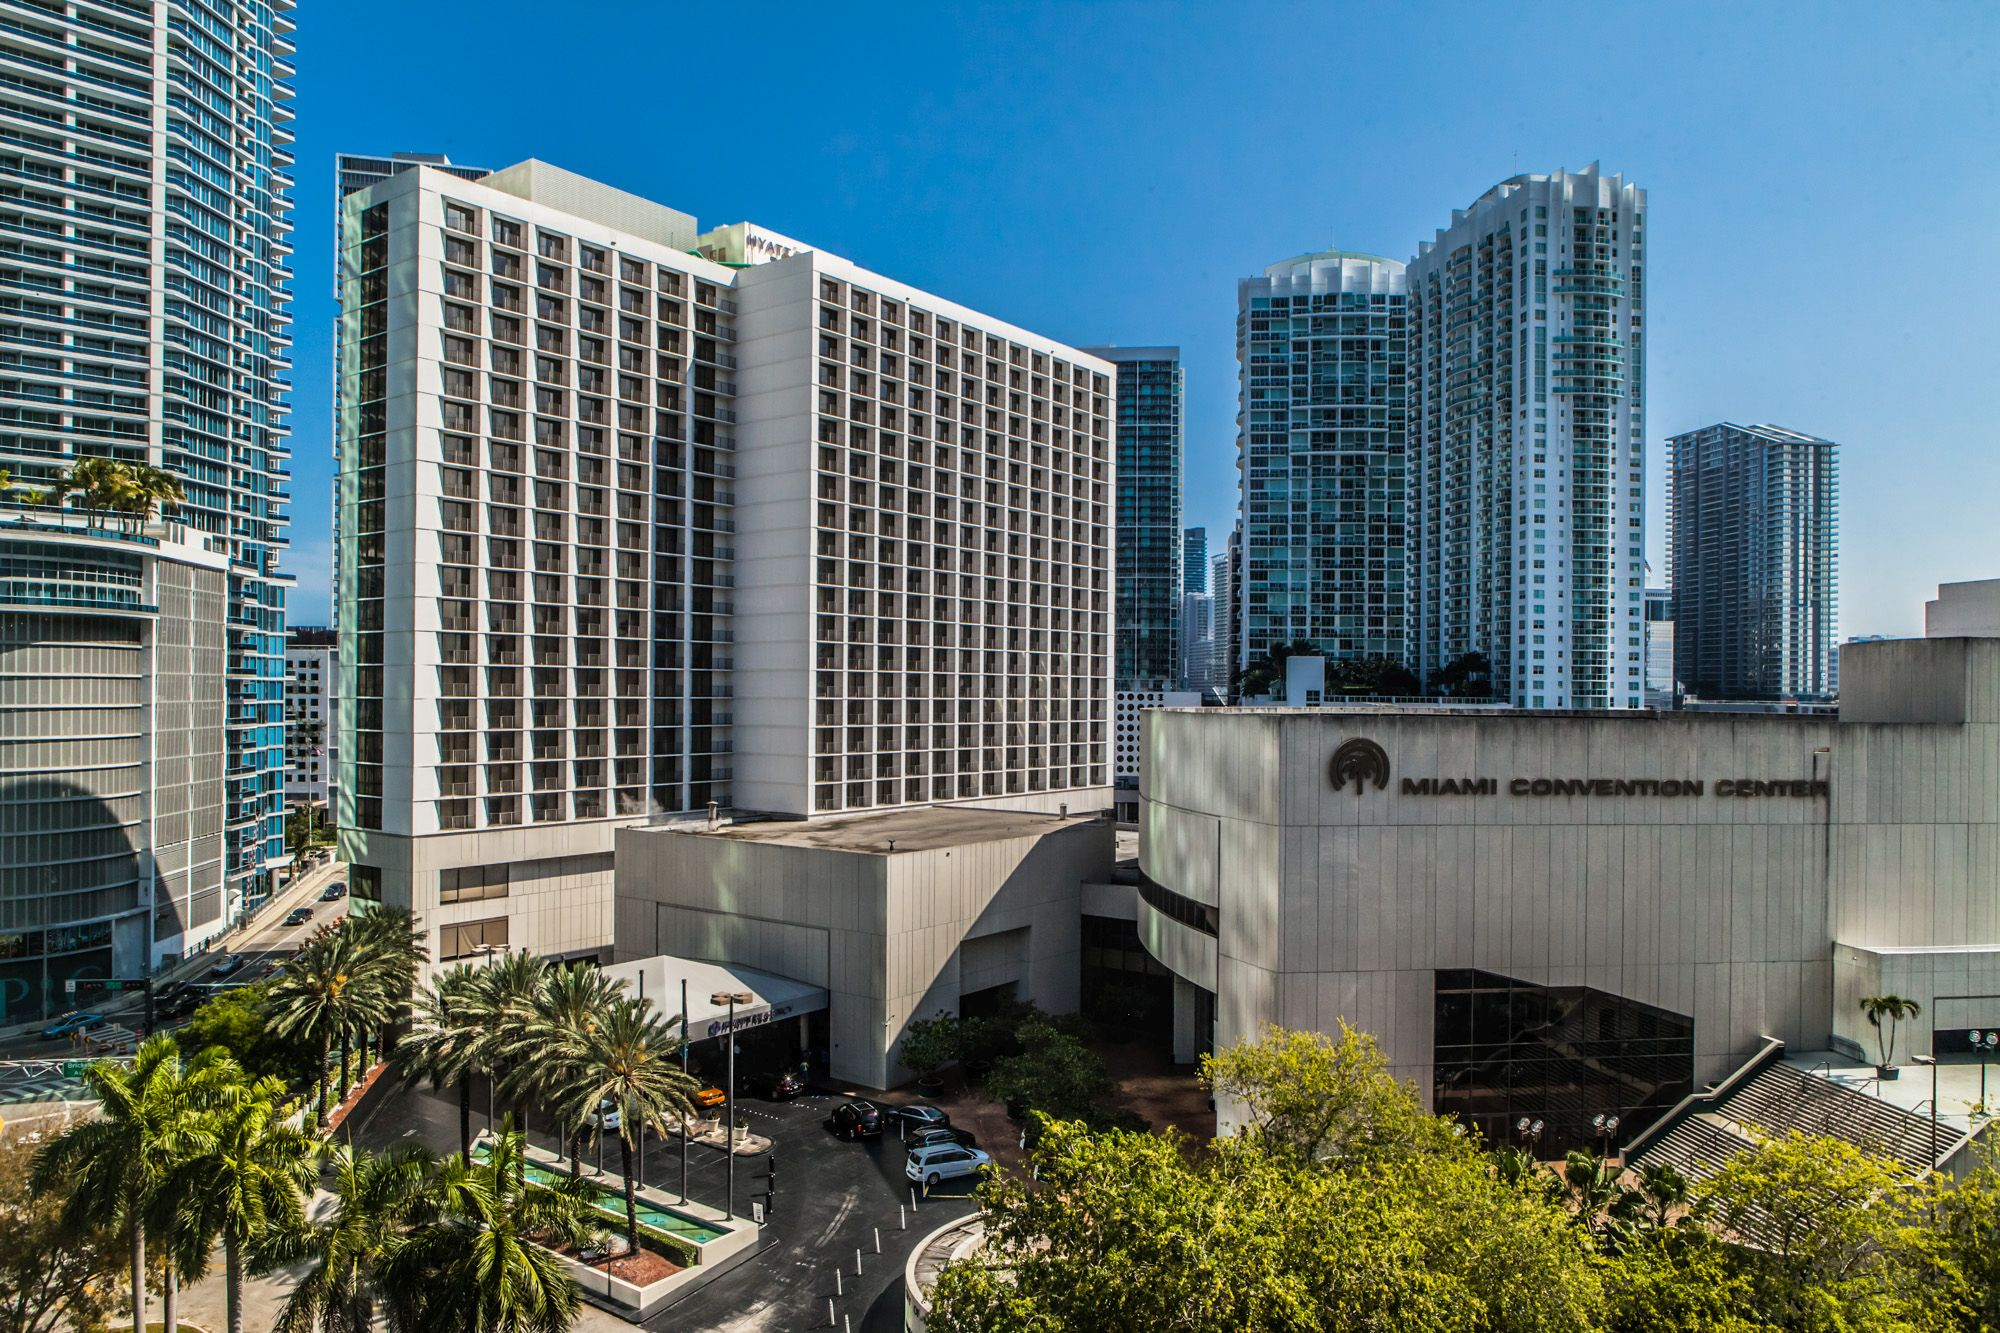 Hotel Review: Hyatt Regency Miami Downtown – Miami Suite